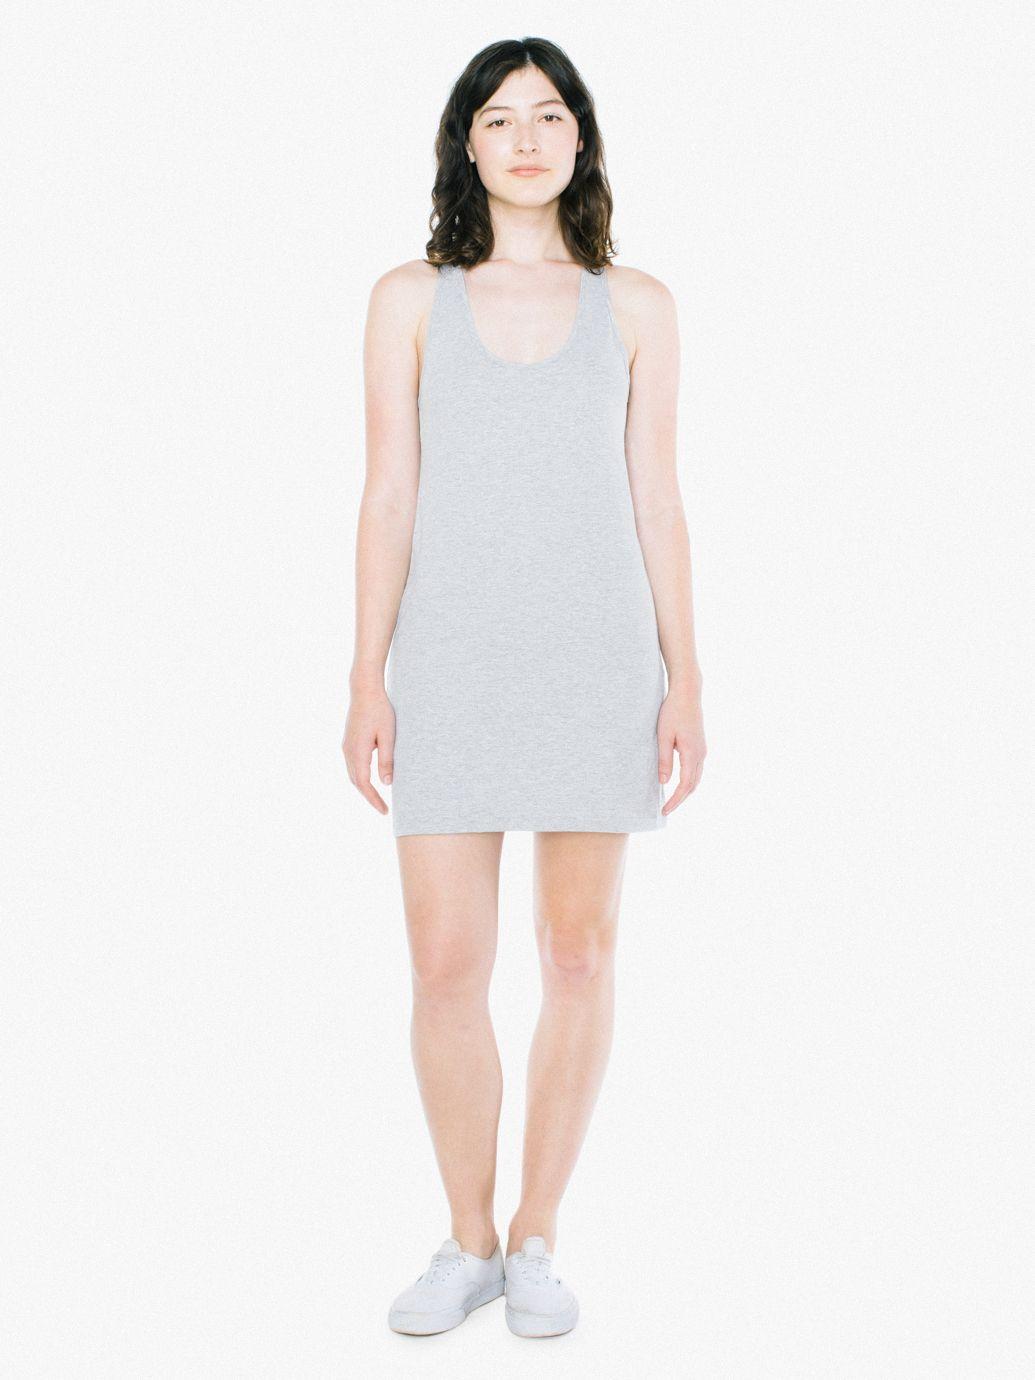 Short Whitecotton Ribbed Tank Dress